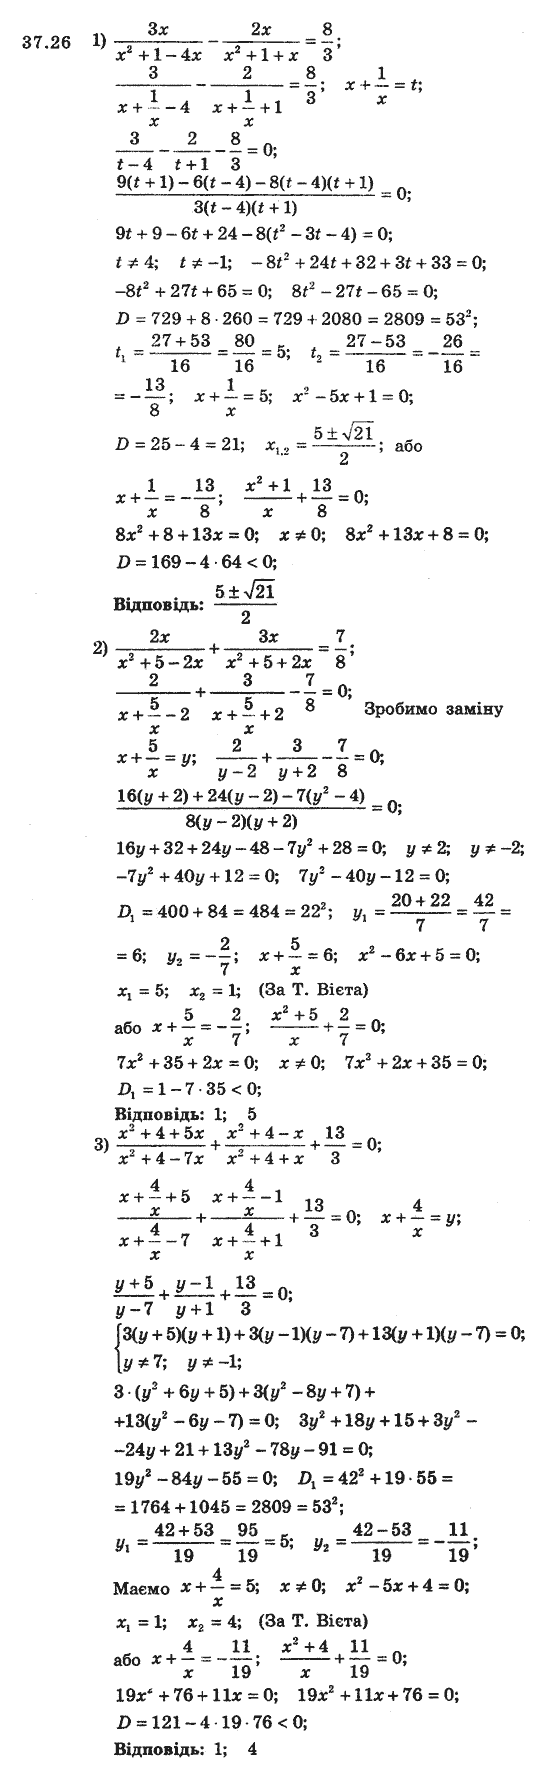 гдз з алгебри за 10 класс мерзляк